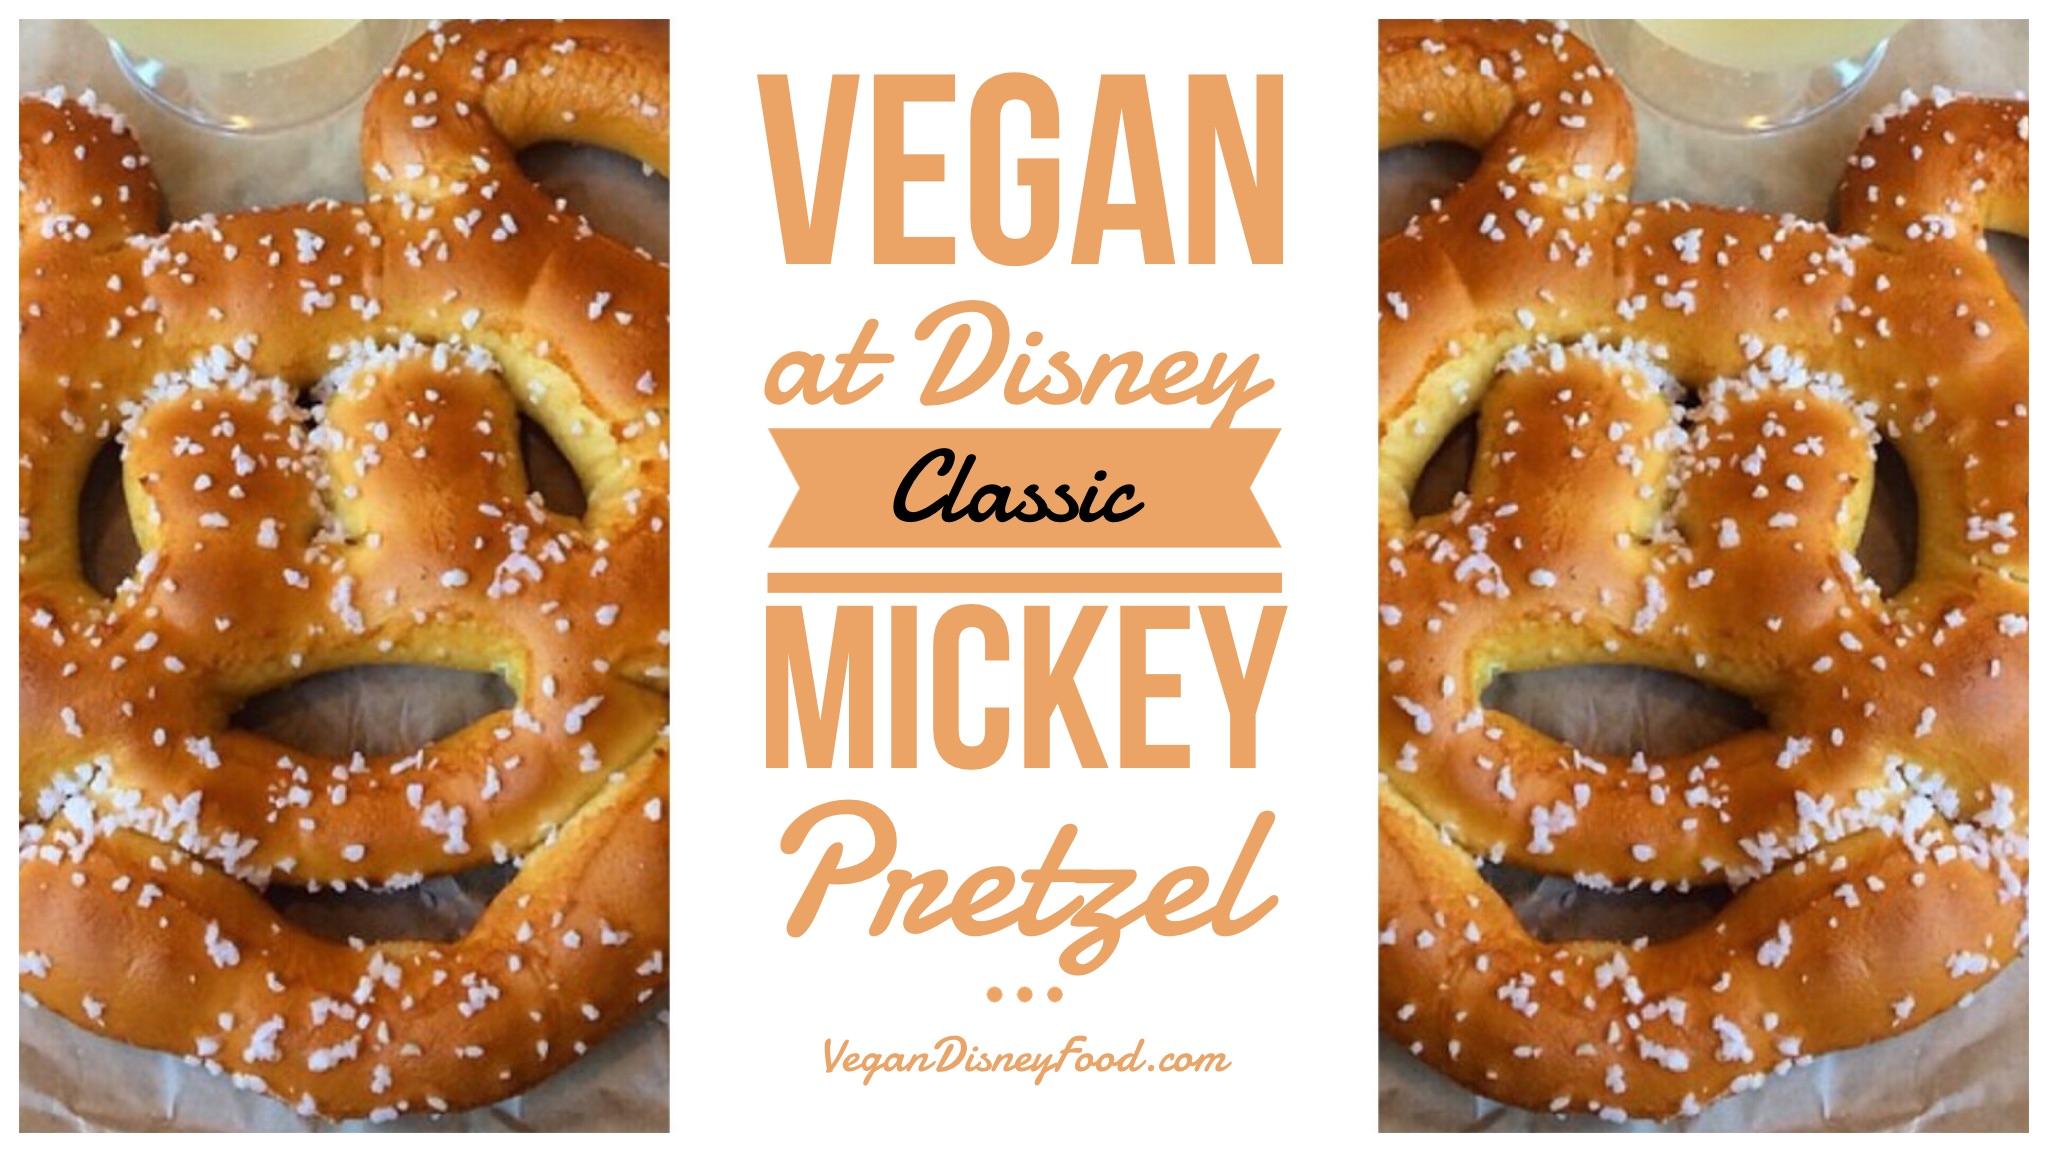 Vegan at Walt Disney World and Disneyland - Classic Mickey Pretzel